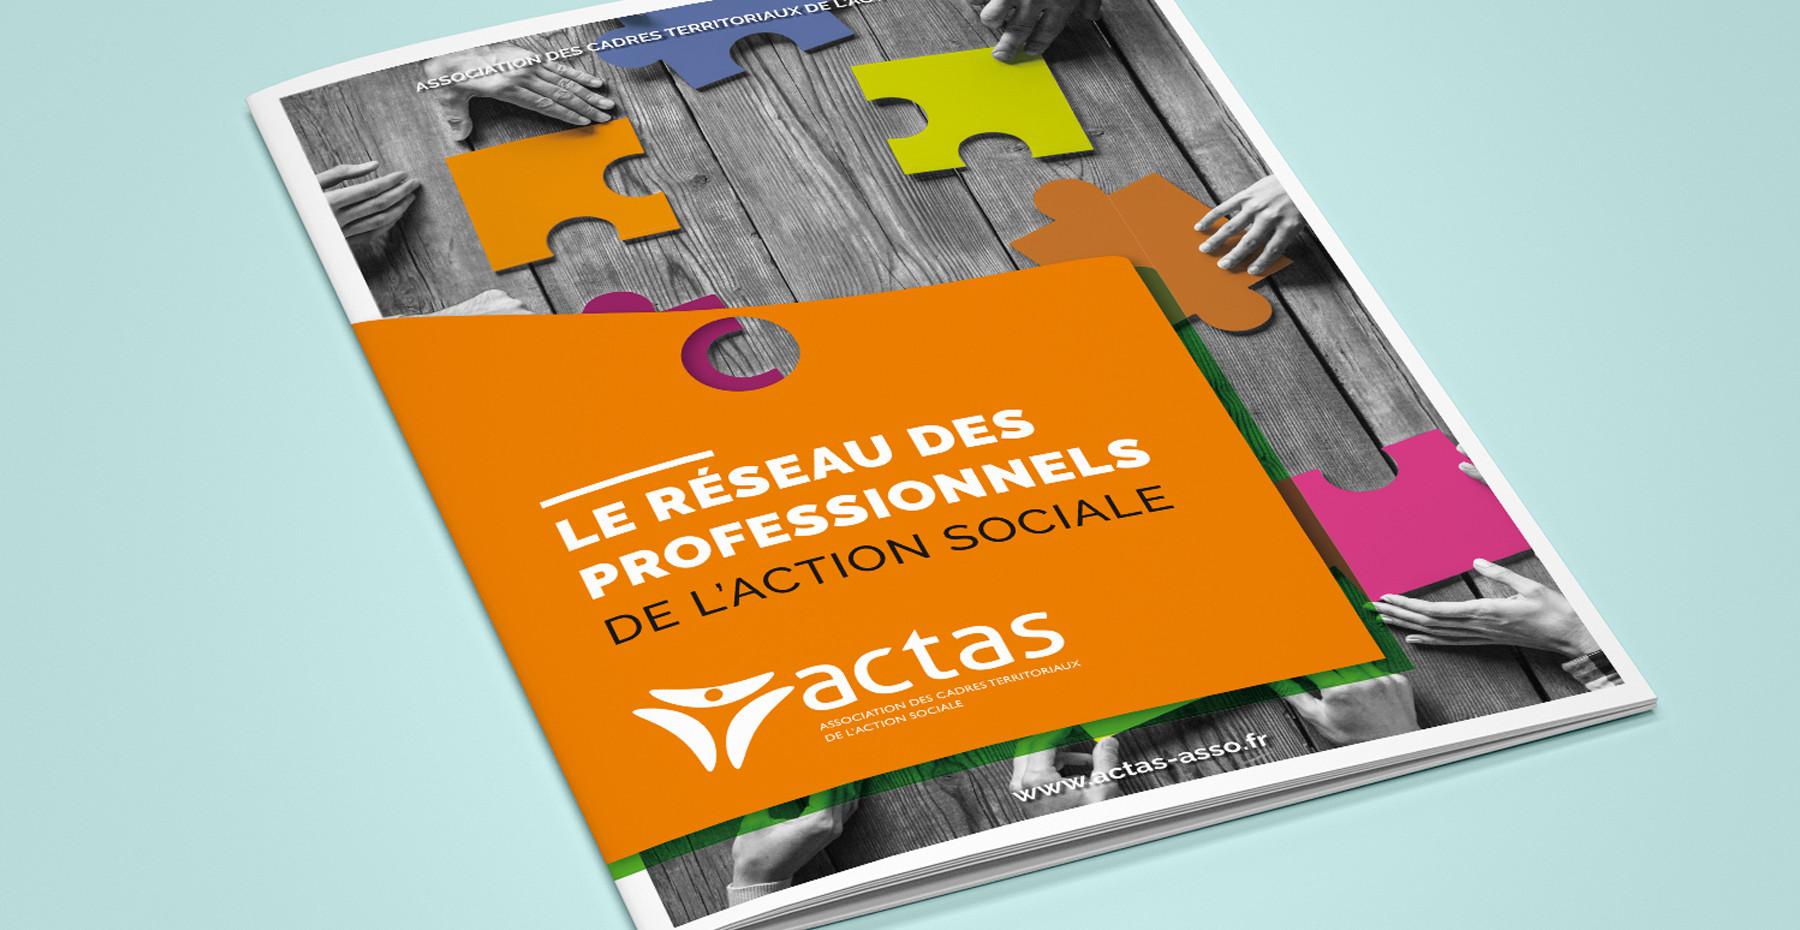 ACTAS-document adhésion.jpg